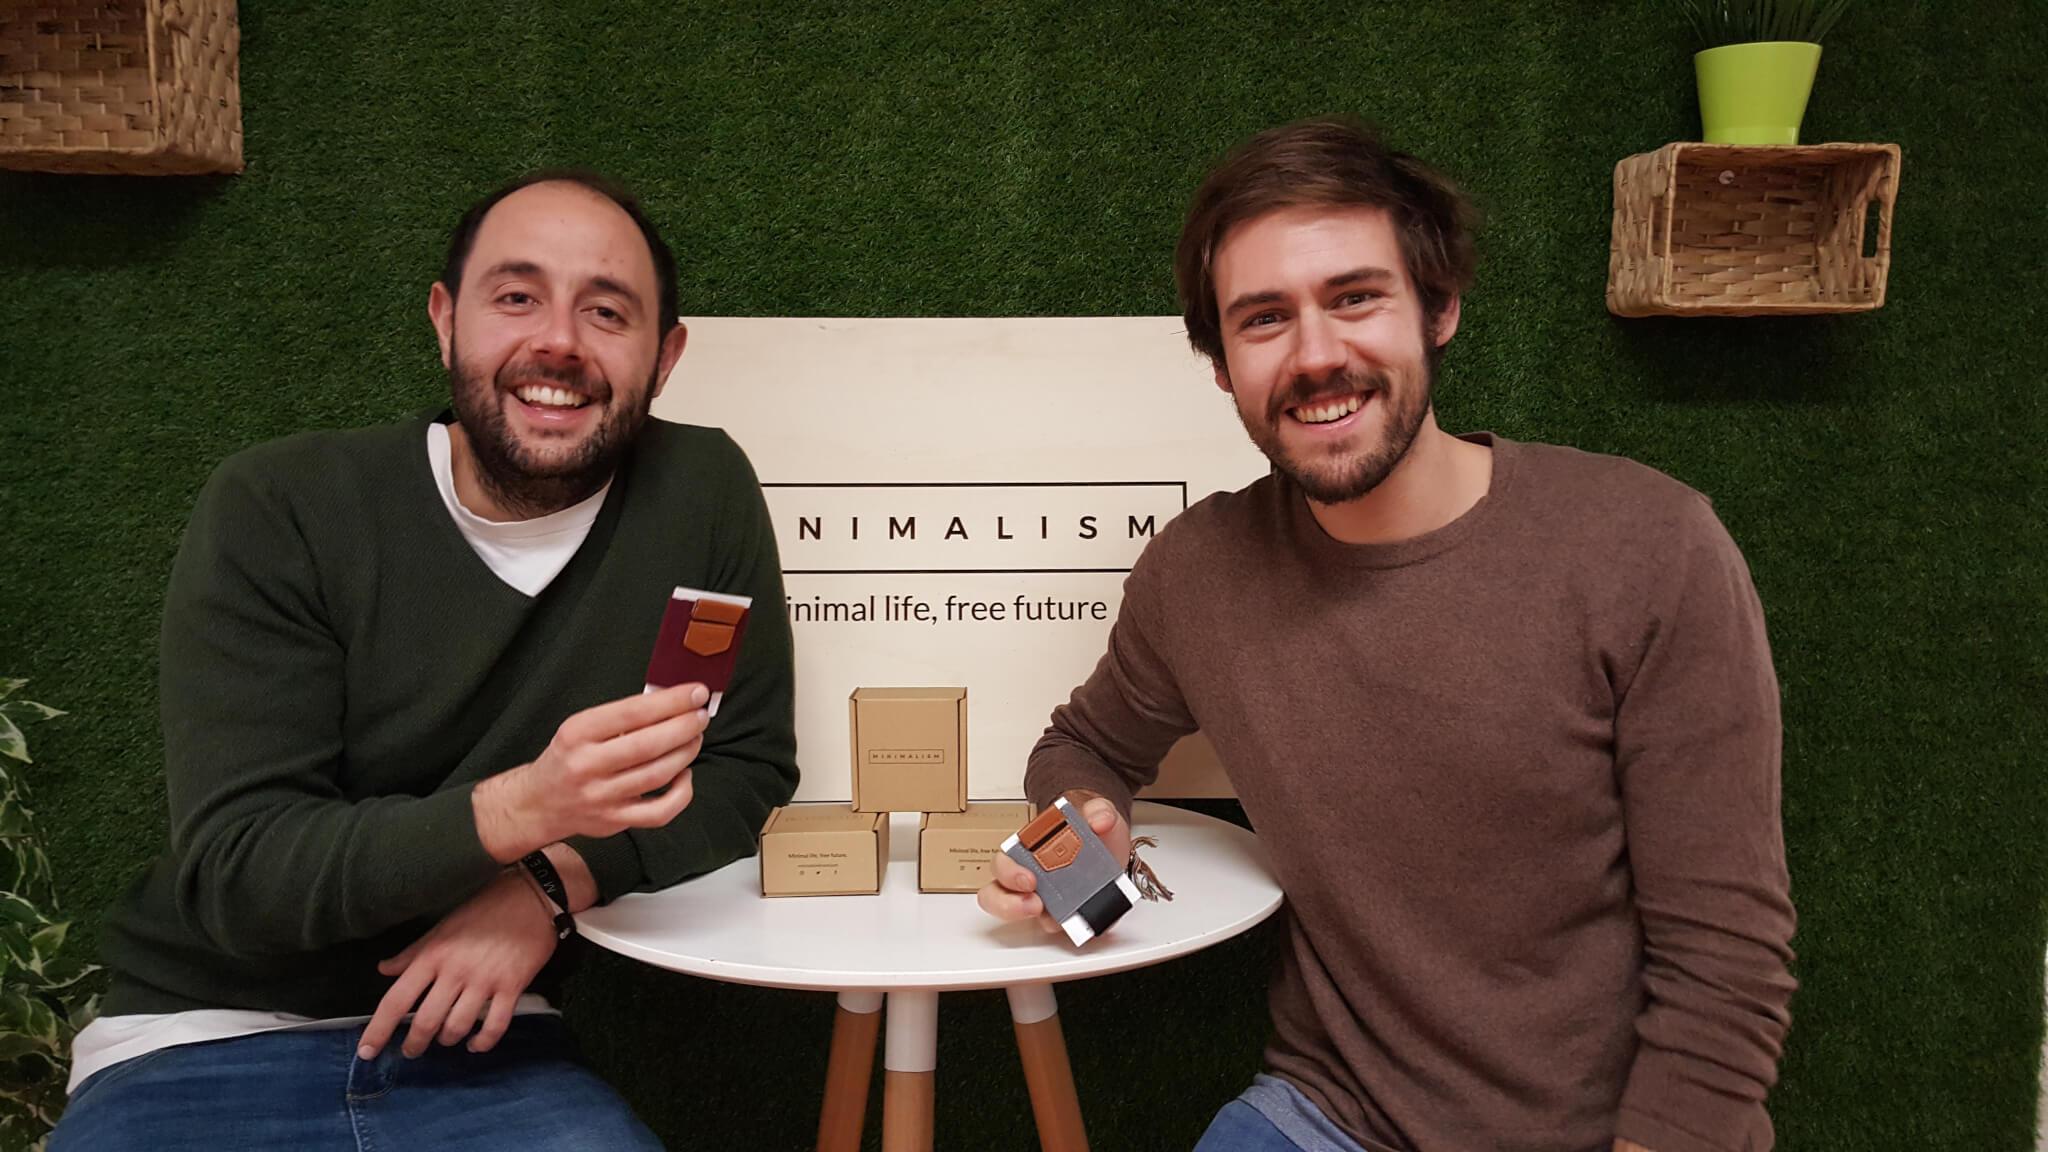 emballage de Minimalism Brand